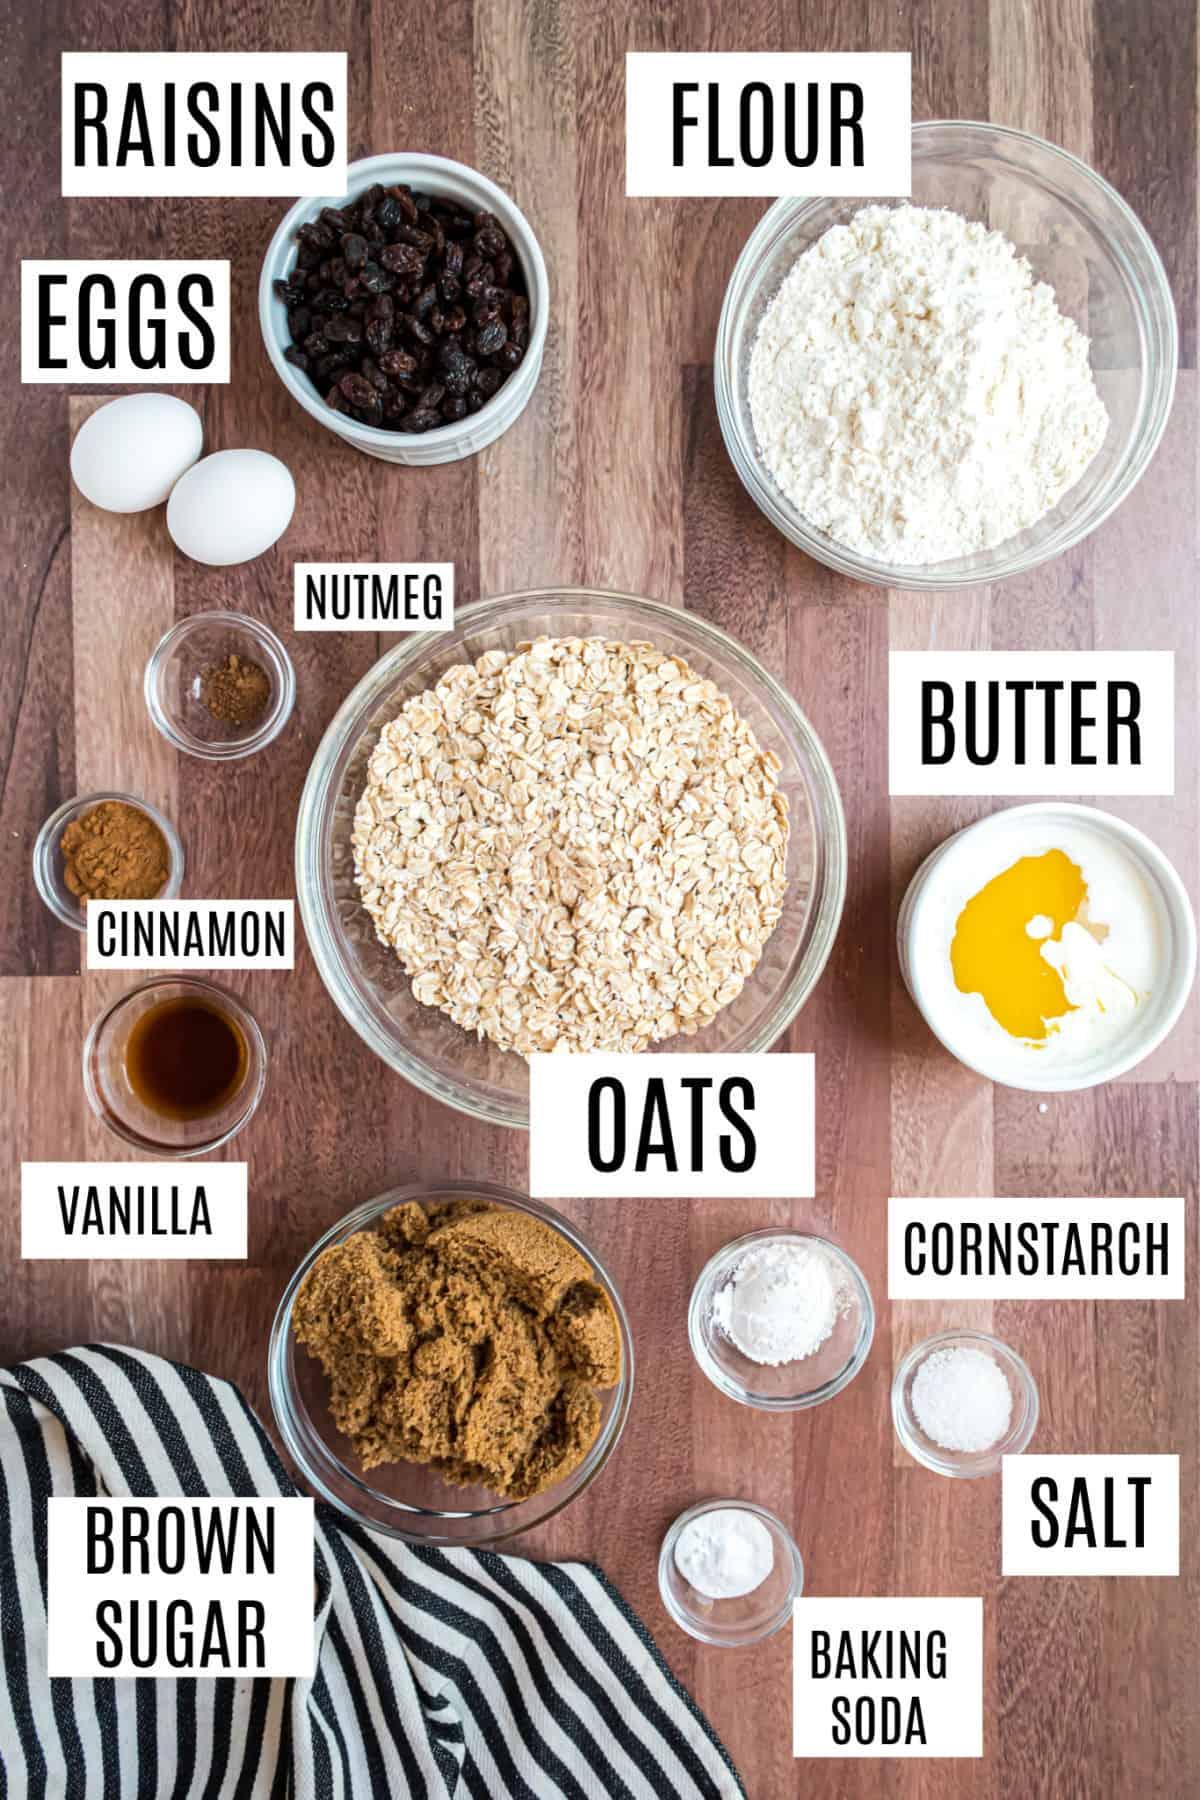 Ingredients needed for oatmeal raisin cookies.